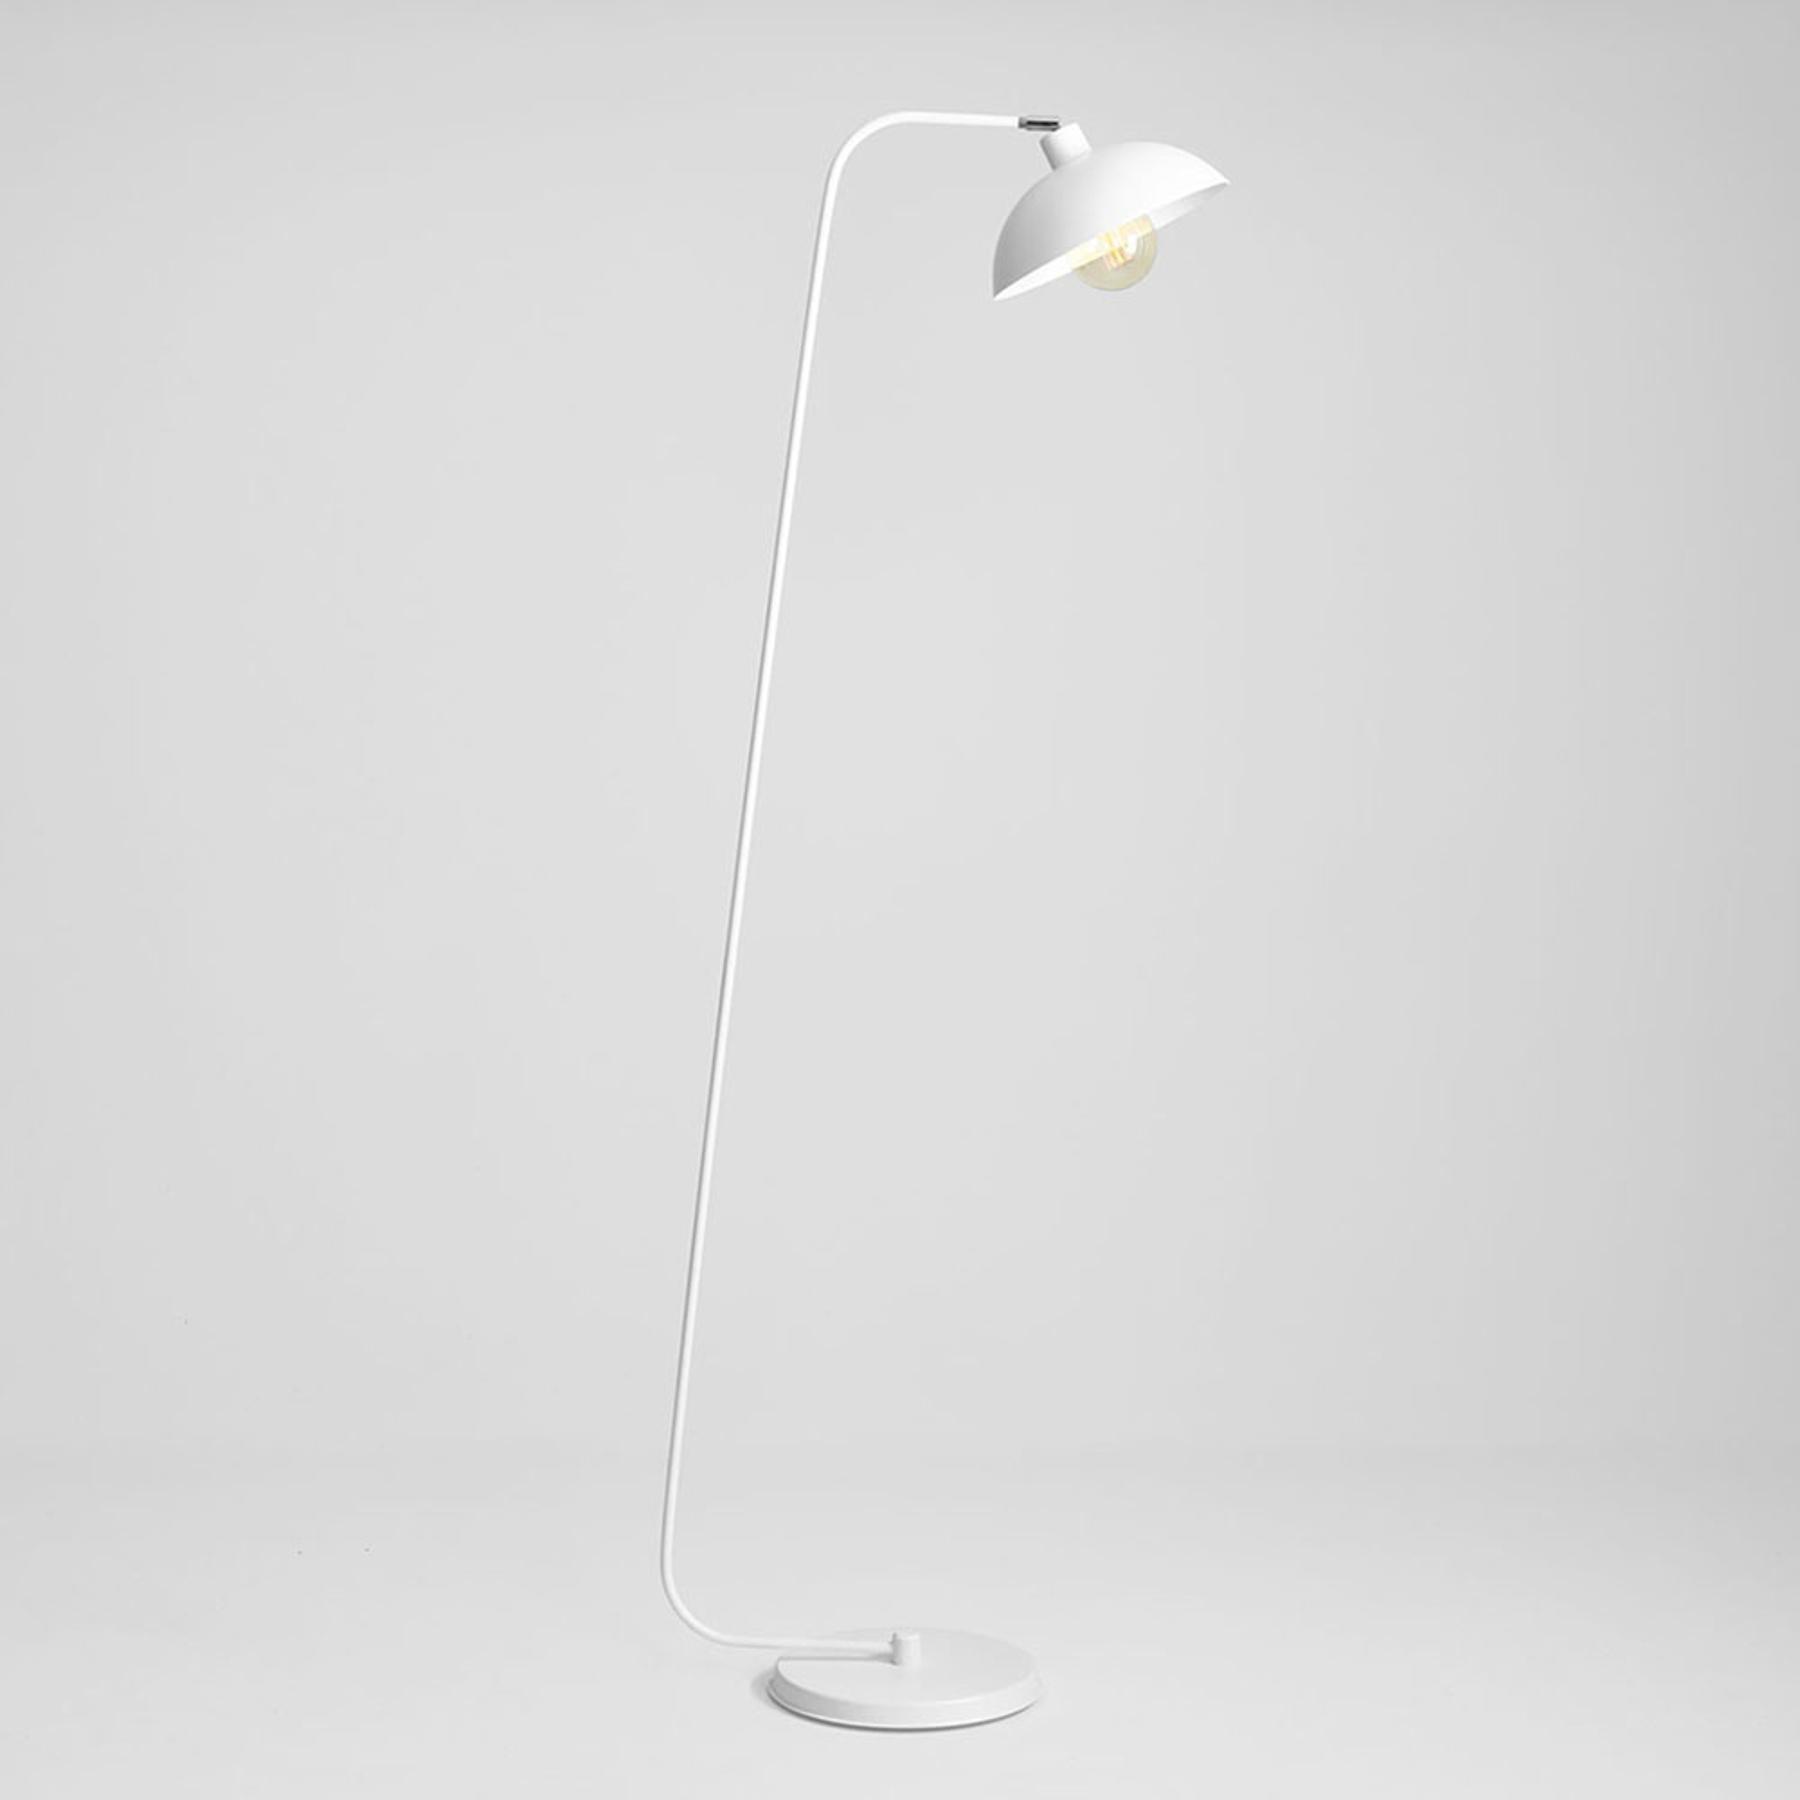 Vloerlamp 1036, 1-lamp, wit